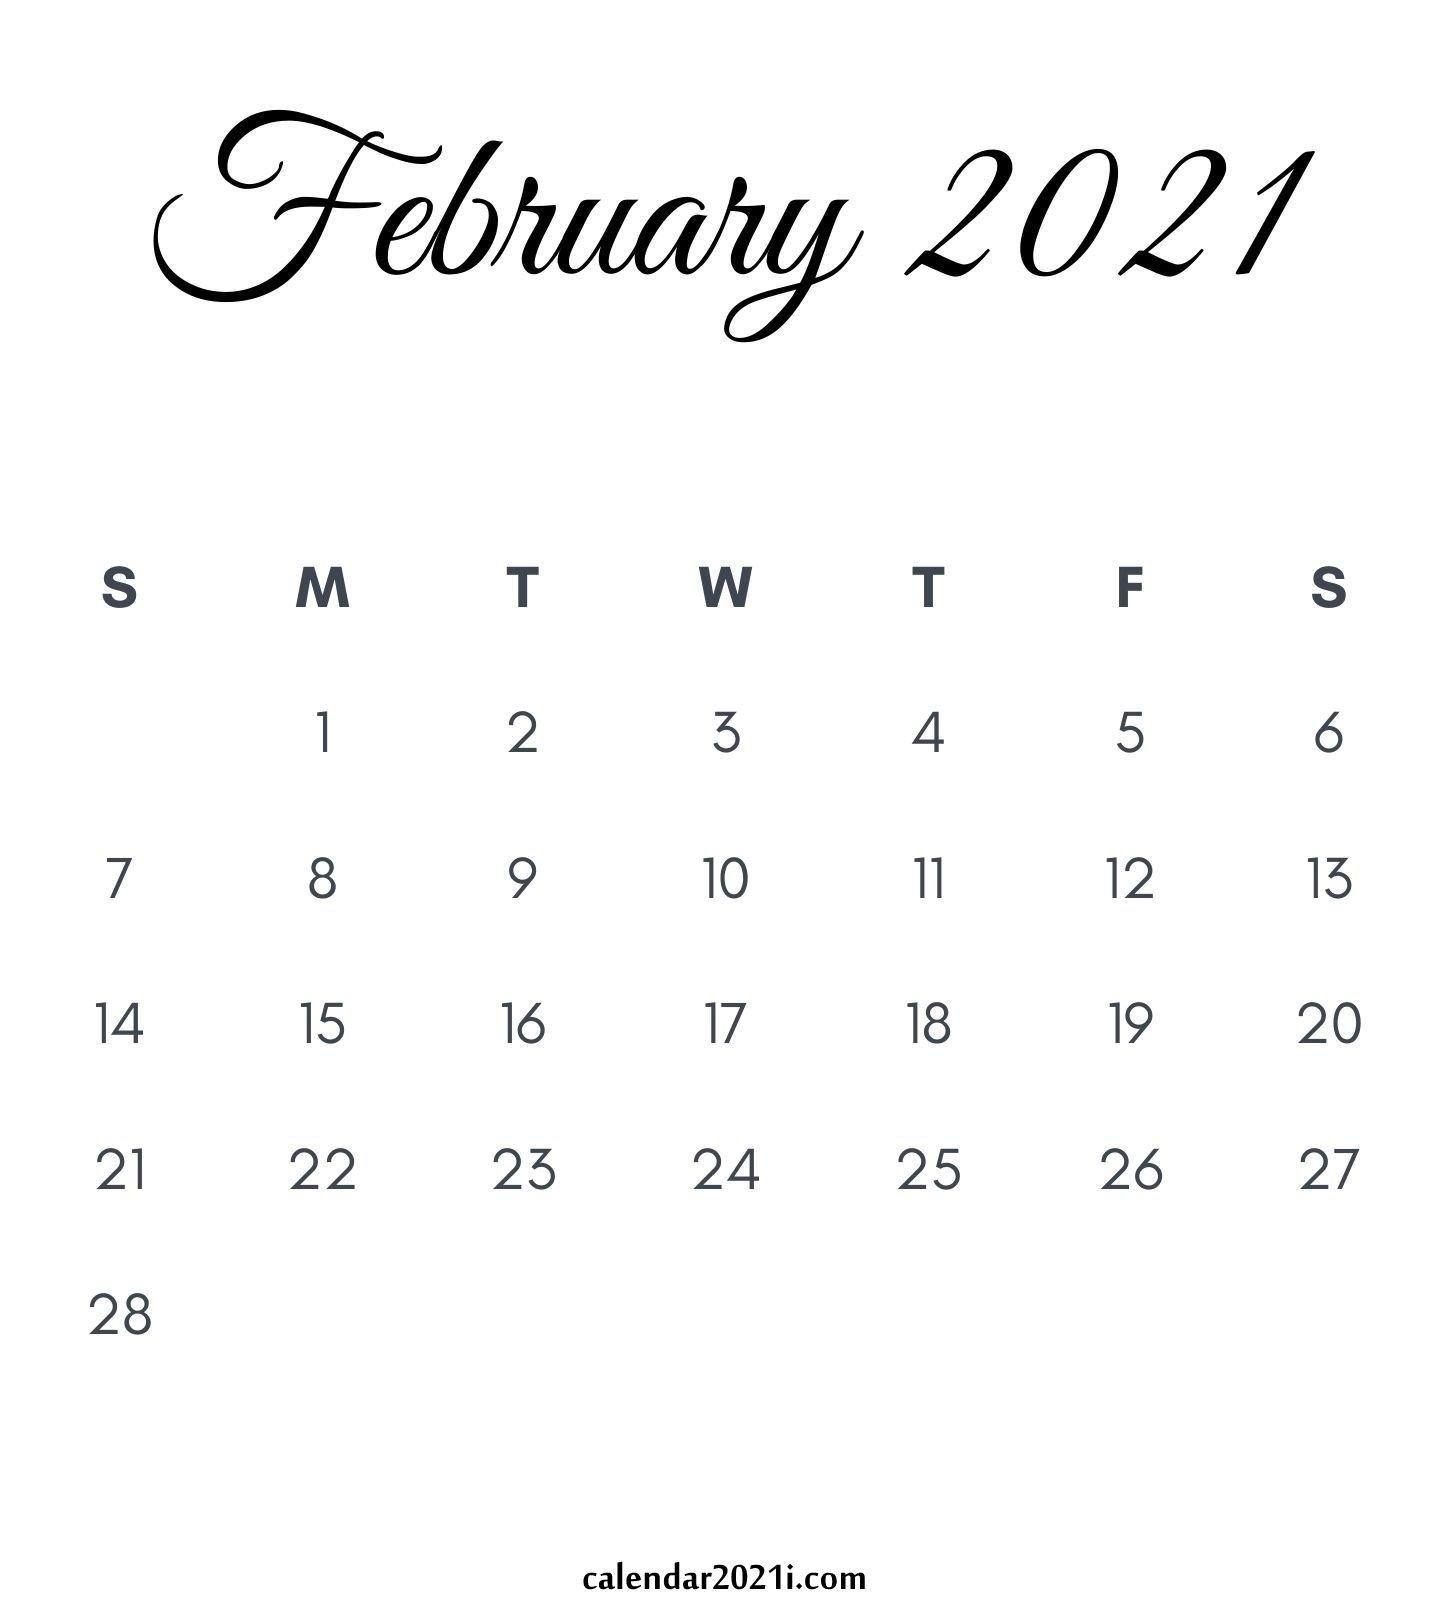 2021 28 Day Expiration Date Calendar   Printable Calendar Template 2021 with regard to 28 Day Medication Expiration 2021